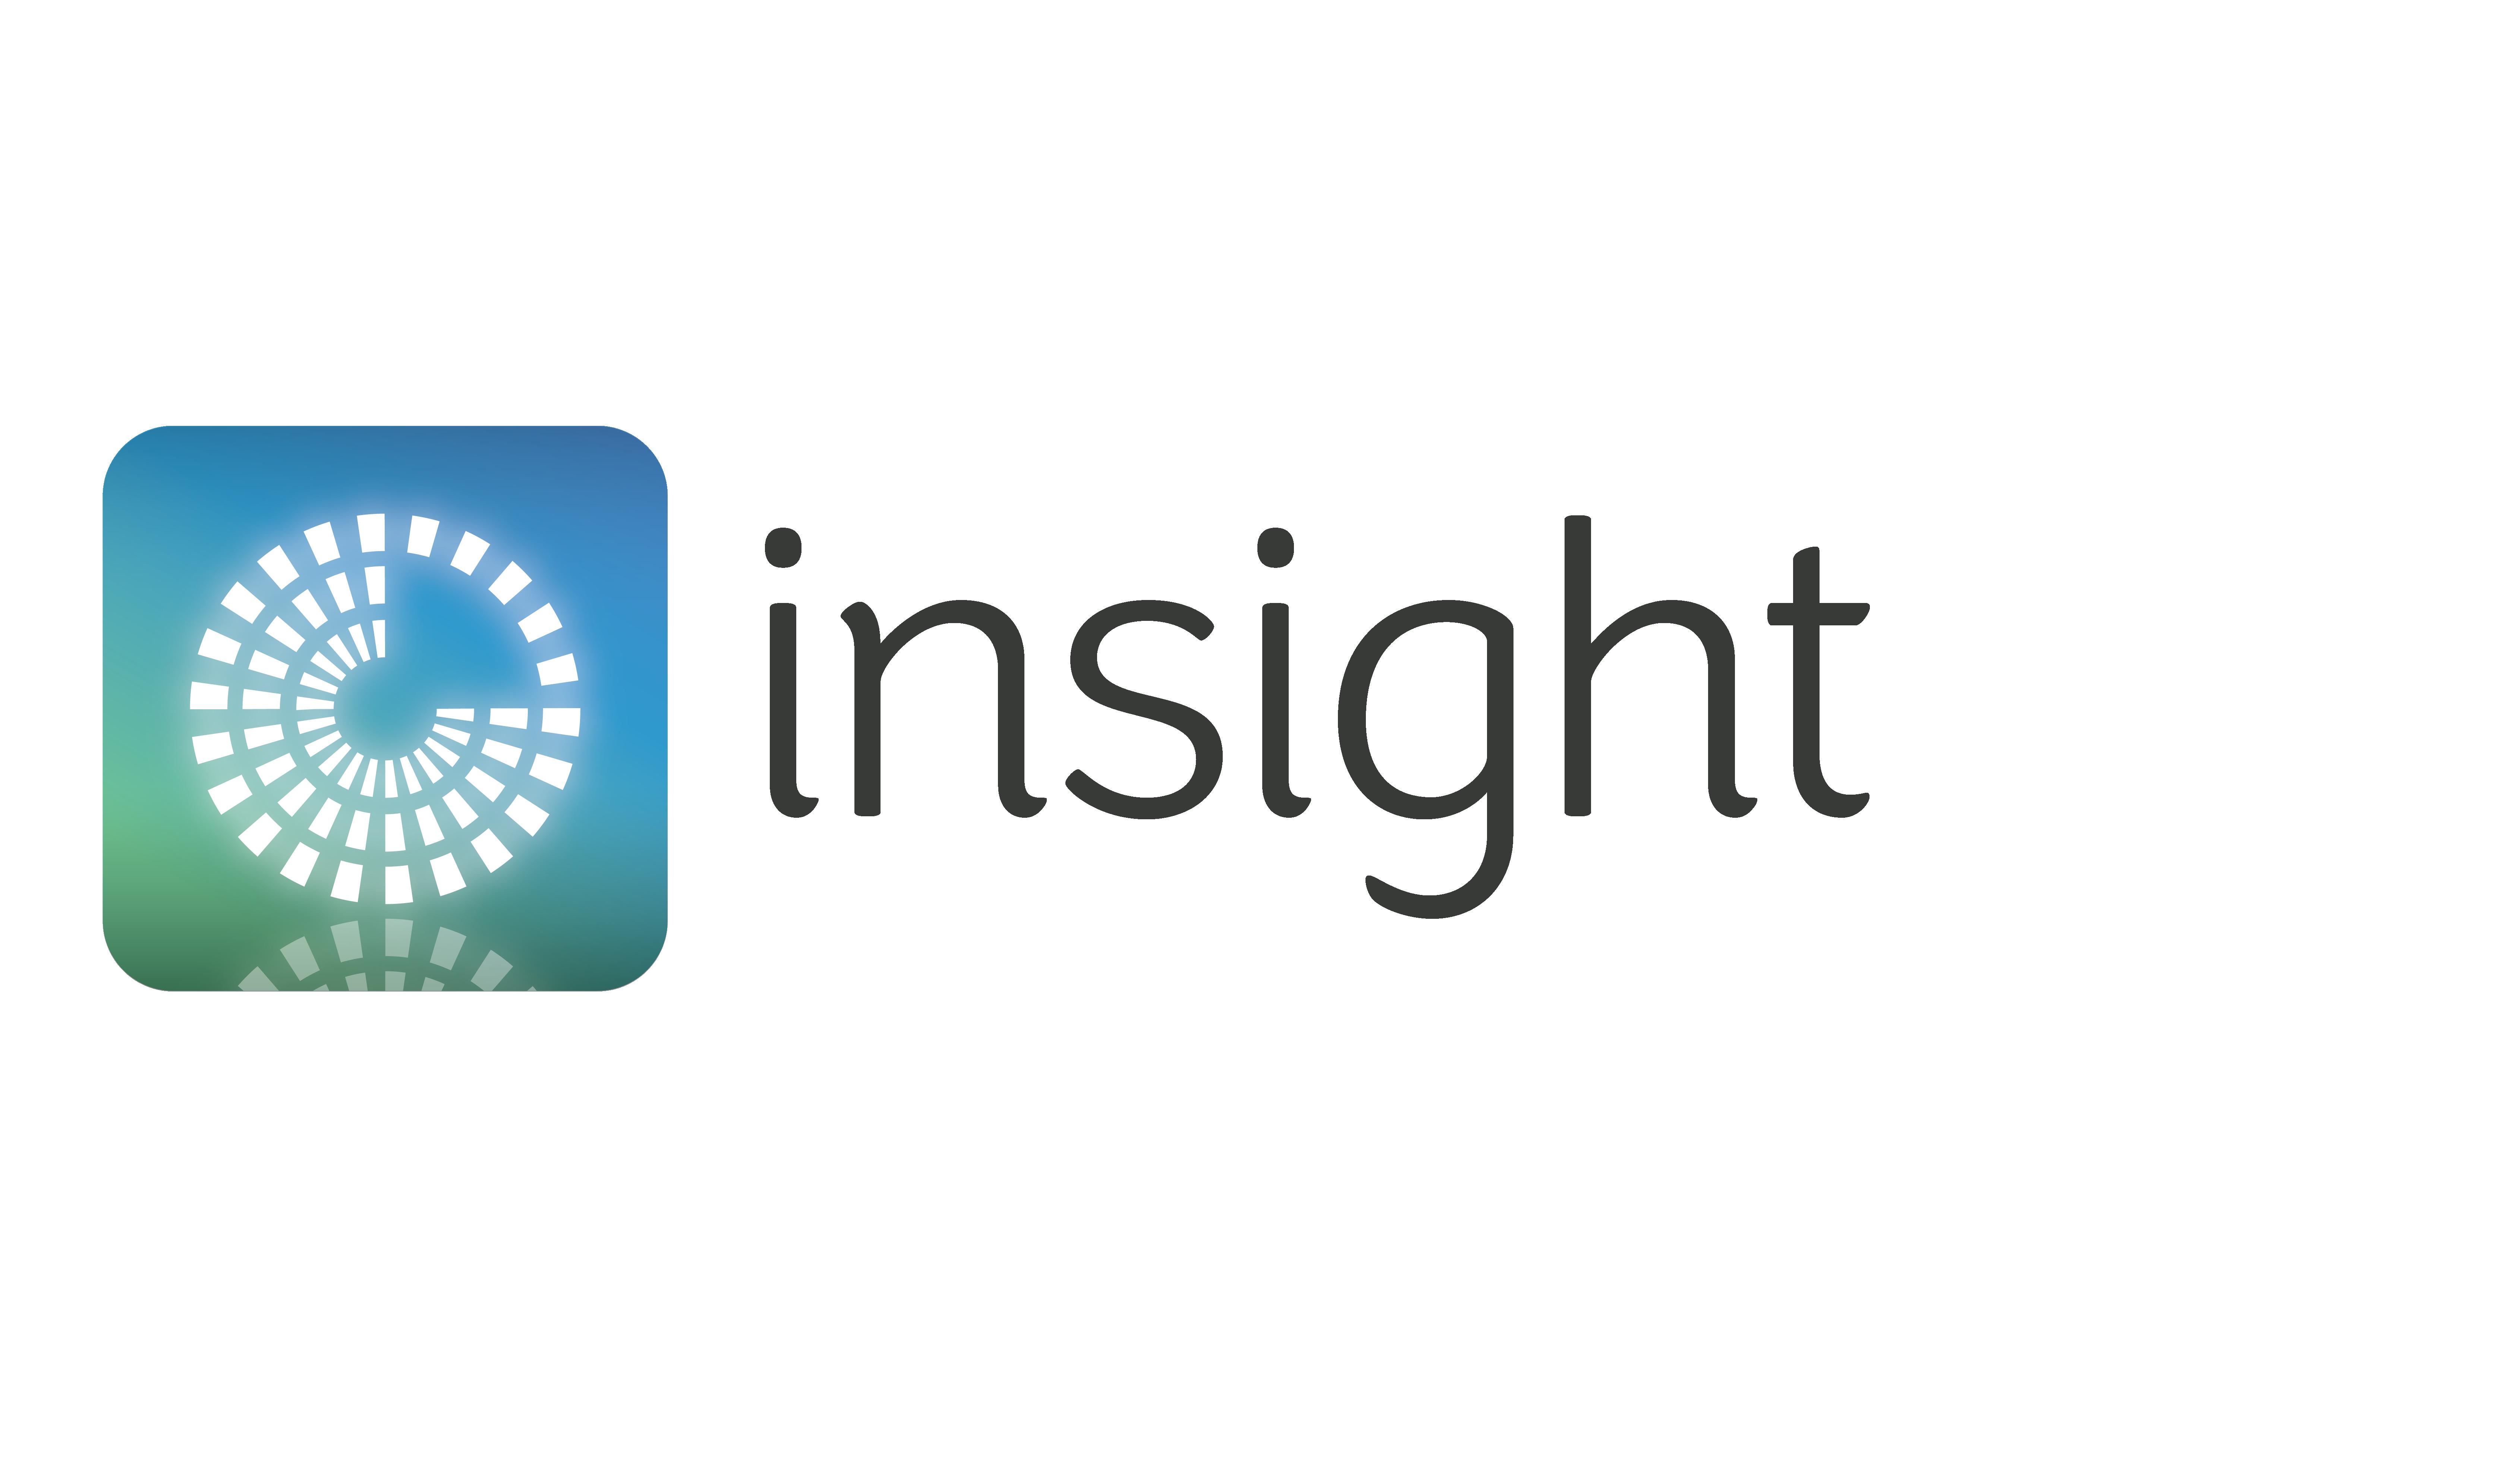 AltaViu_Insight_1